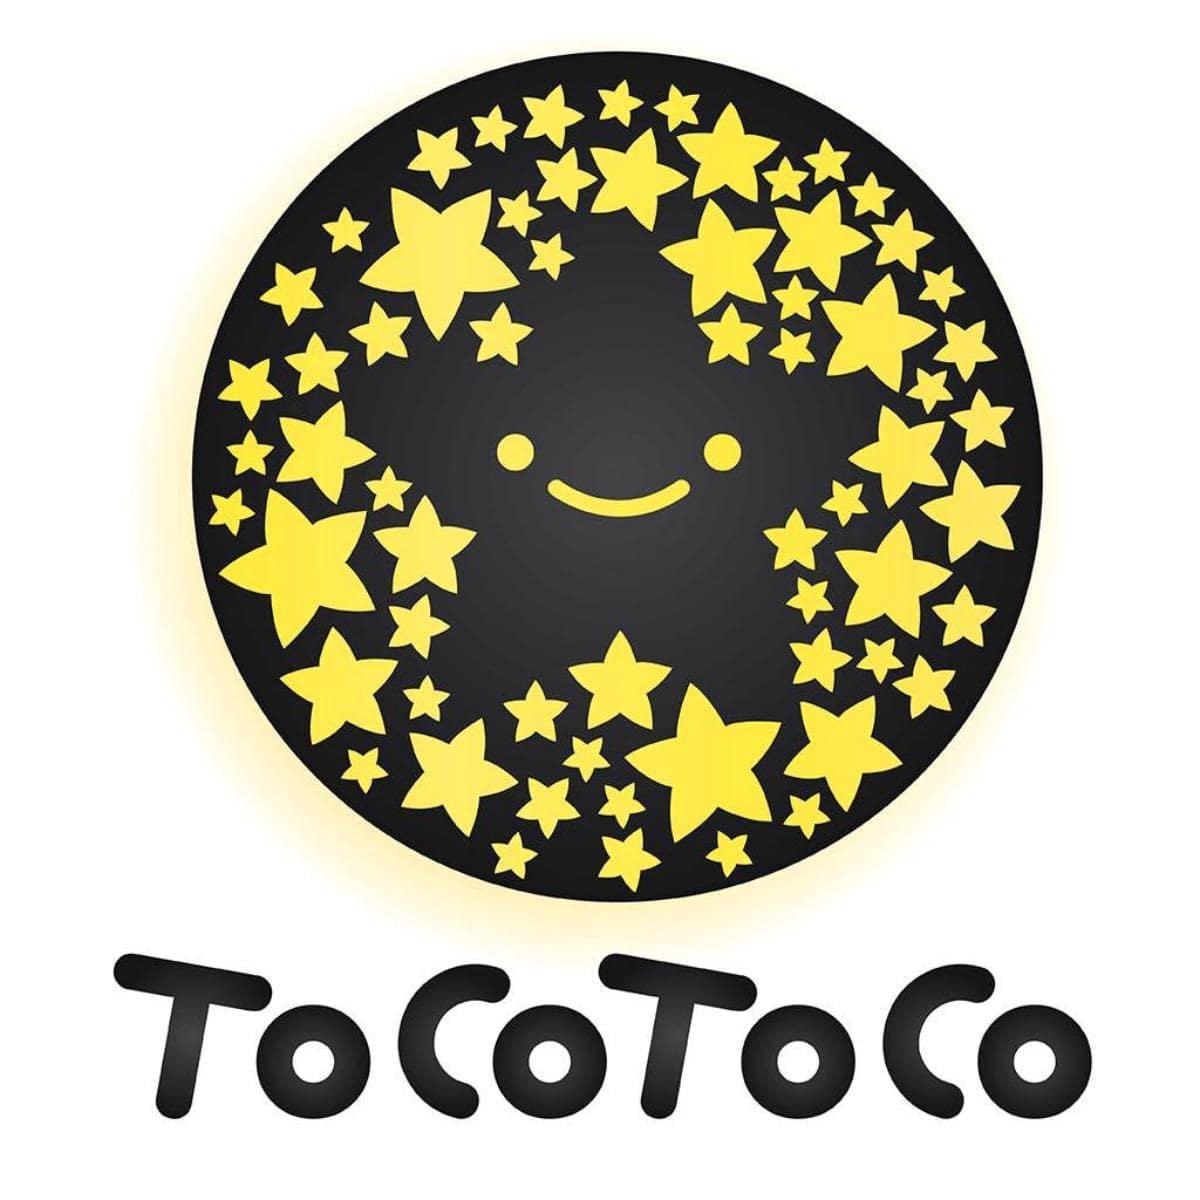 Đồng phục của Tocotoco